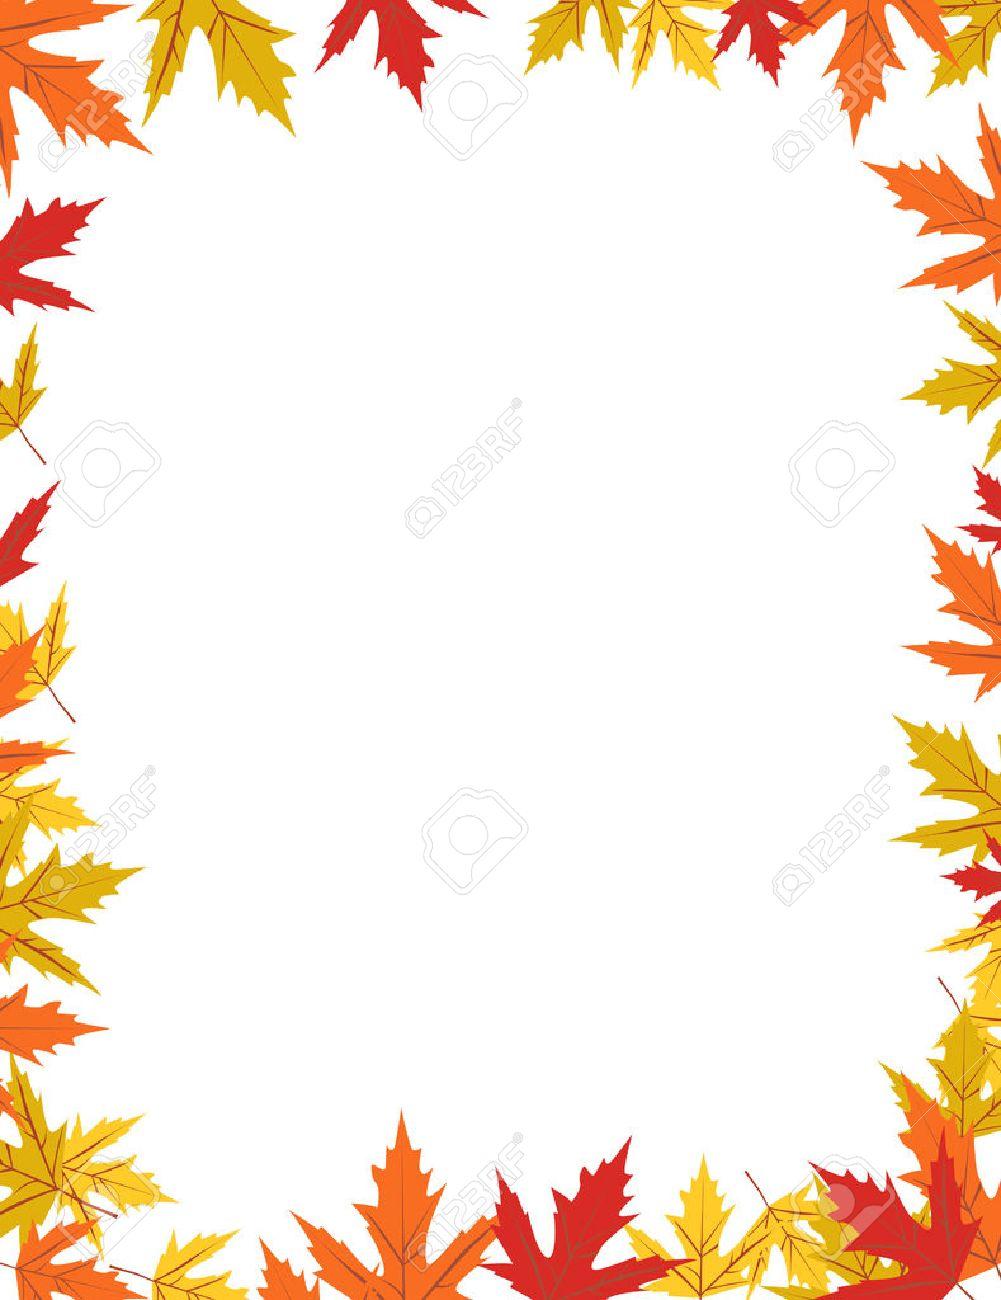 autumn border design vector illustration royalty free cliparts